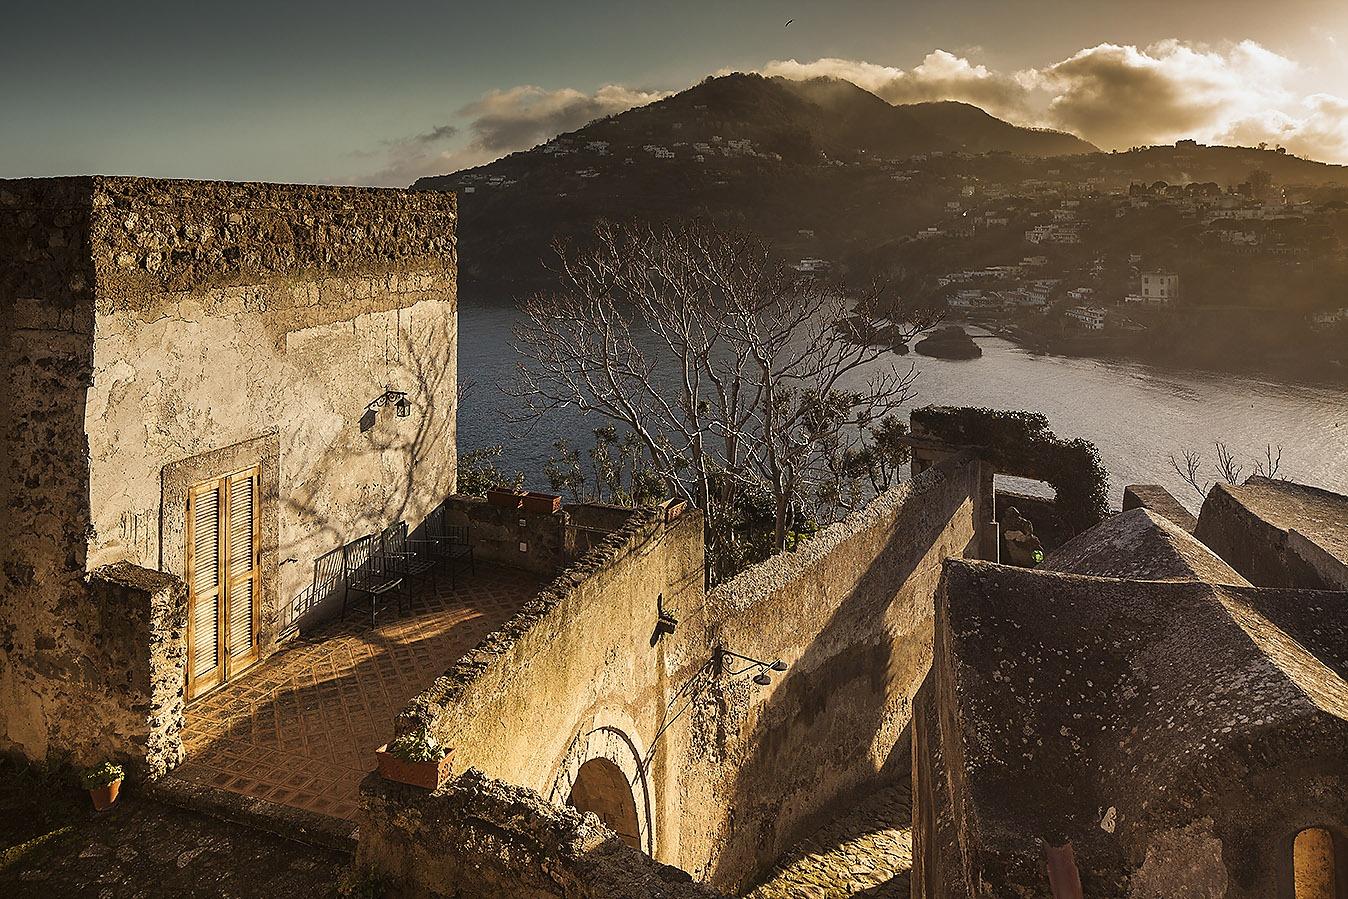 Vista dal Castello Aragonese